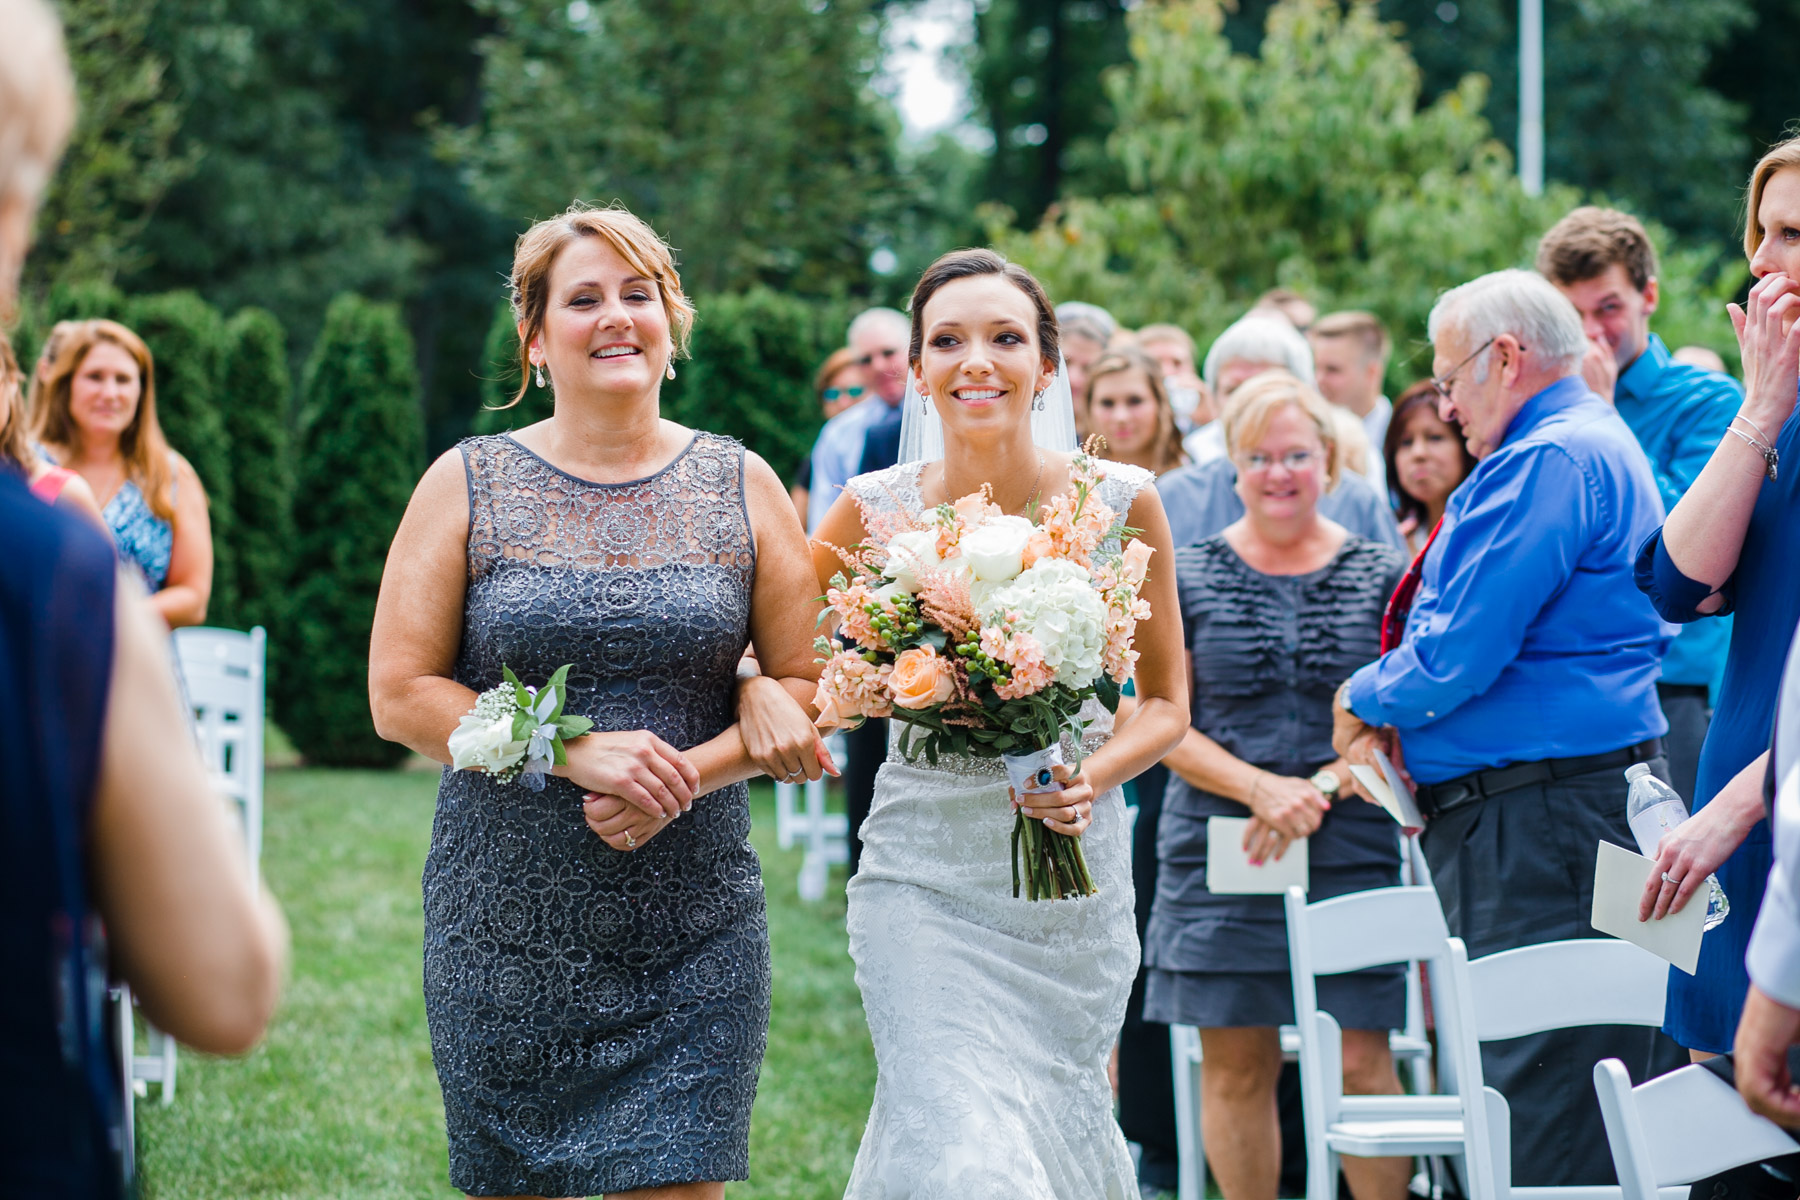 wildwood-park-wedding-photos-39.jpg